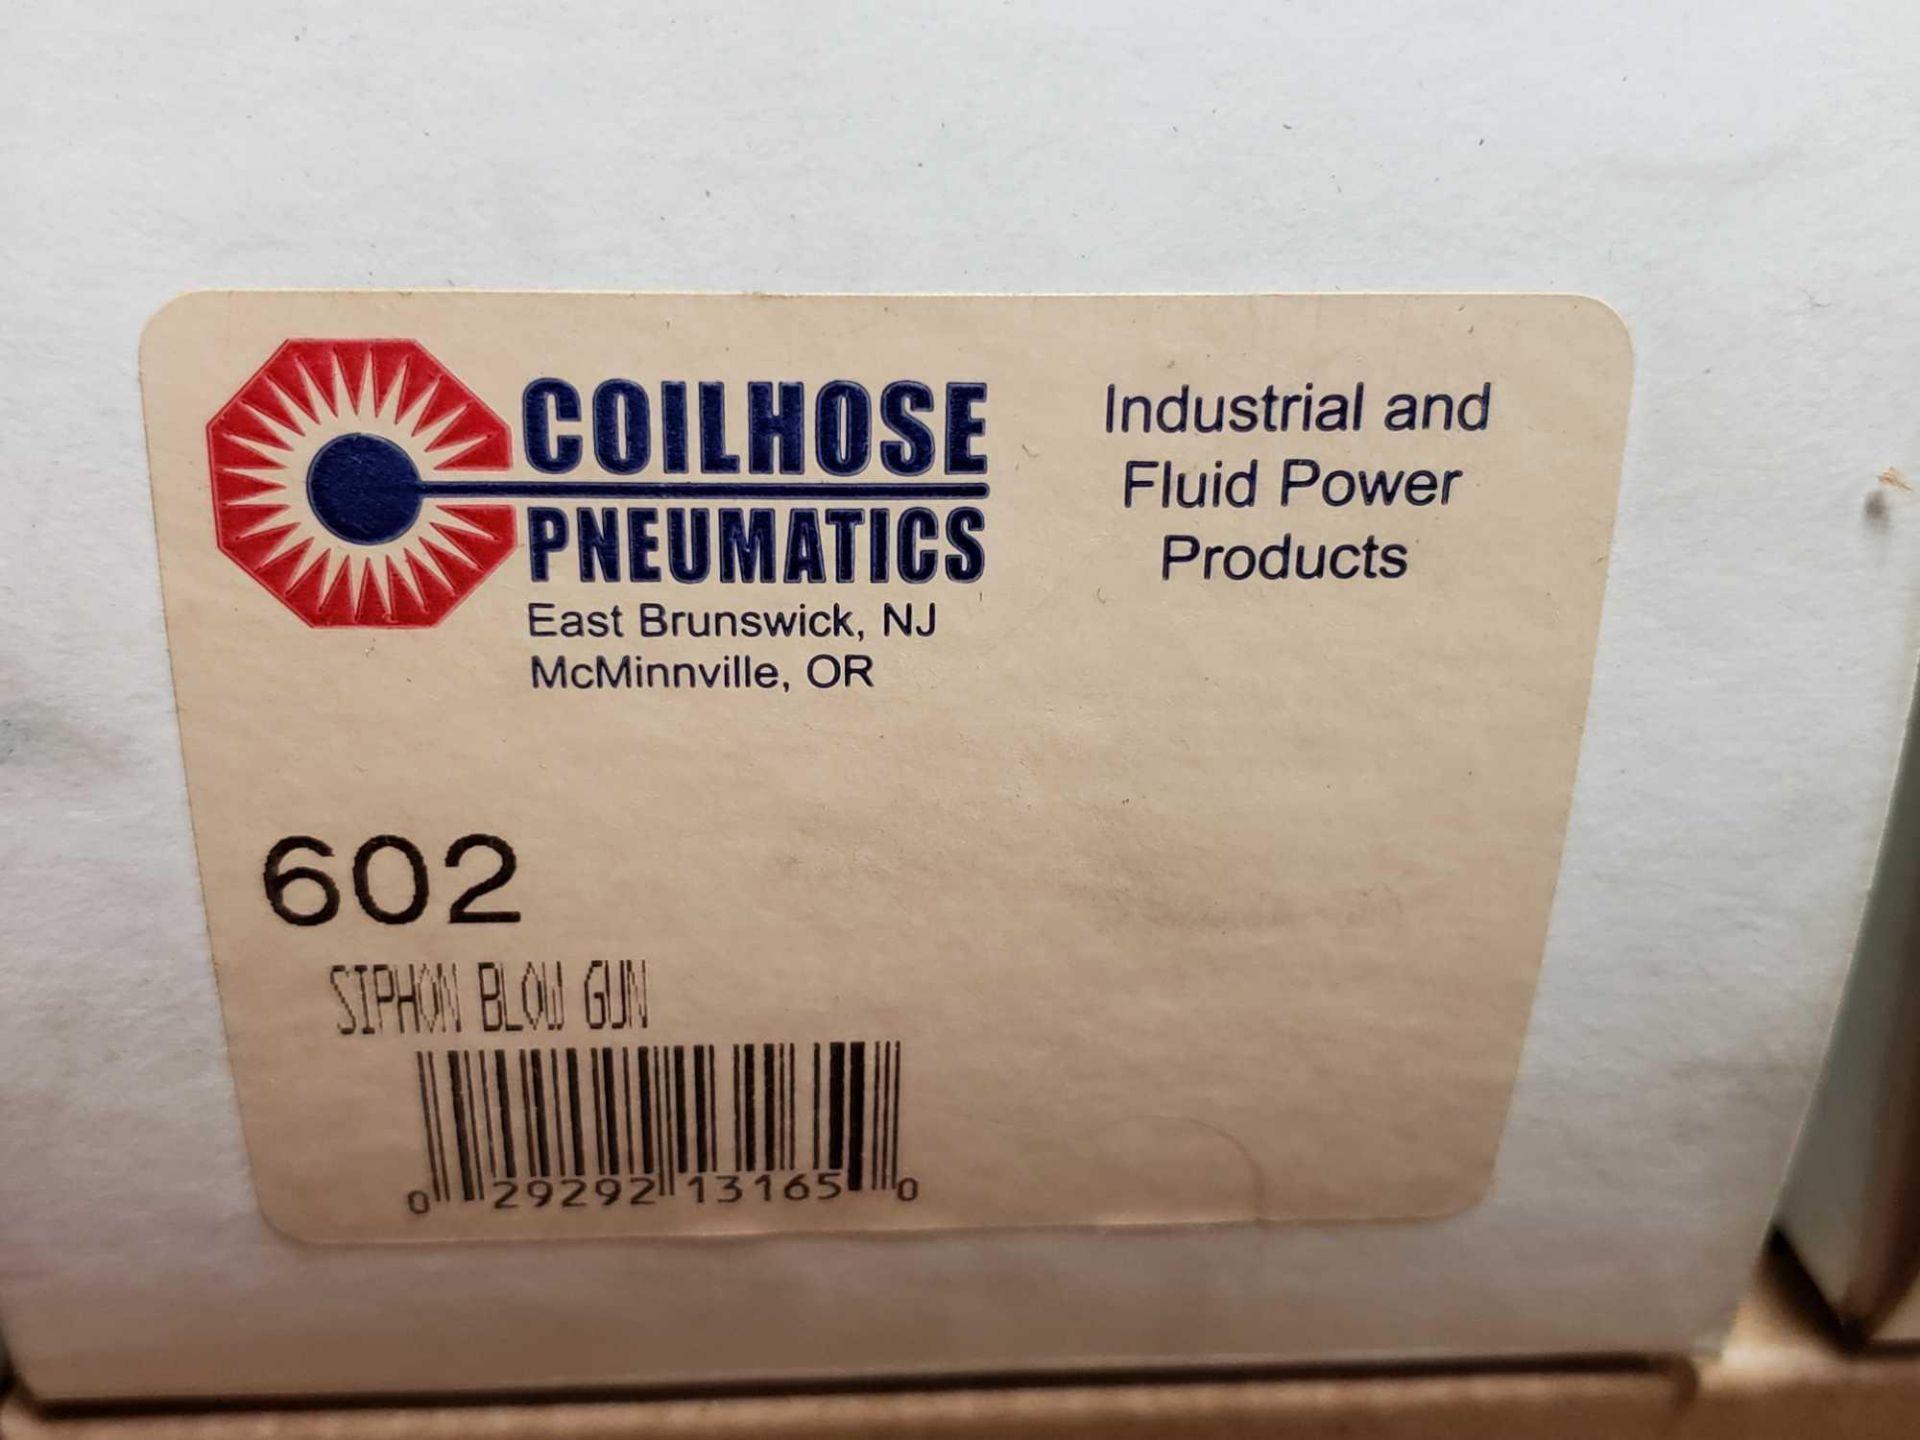 Lot 38 - Qty 4 - Coilhouse Pneumatics model 602 model blow gun. New in box.